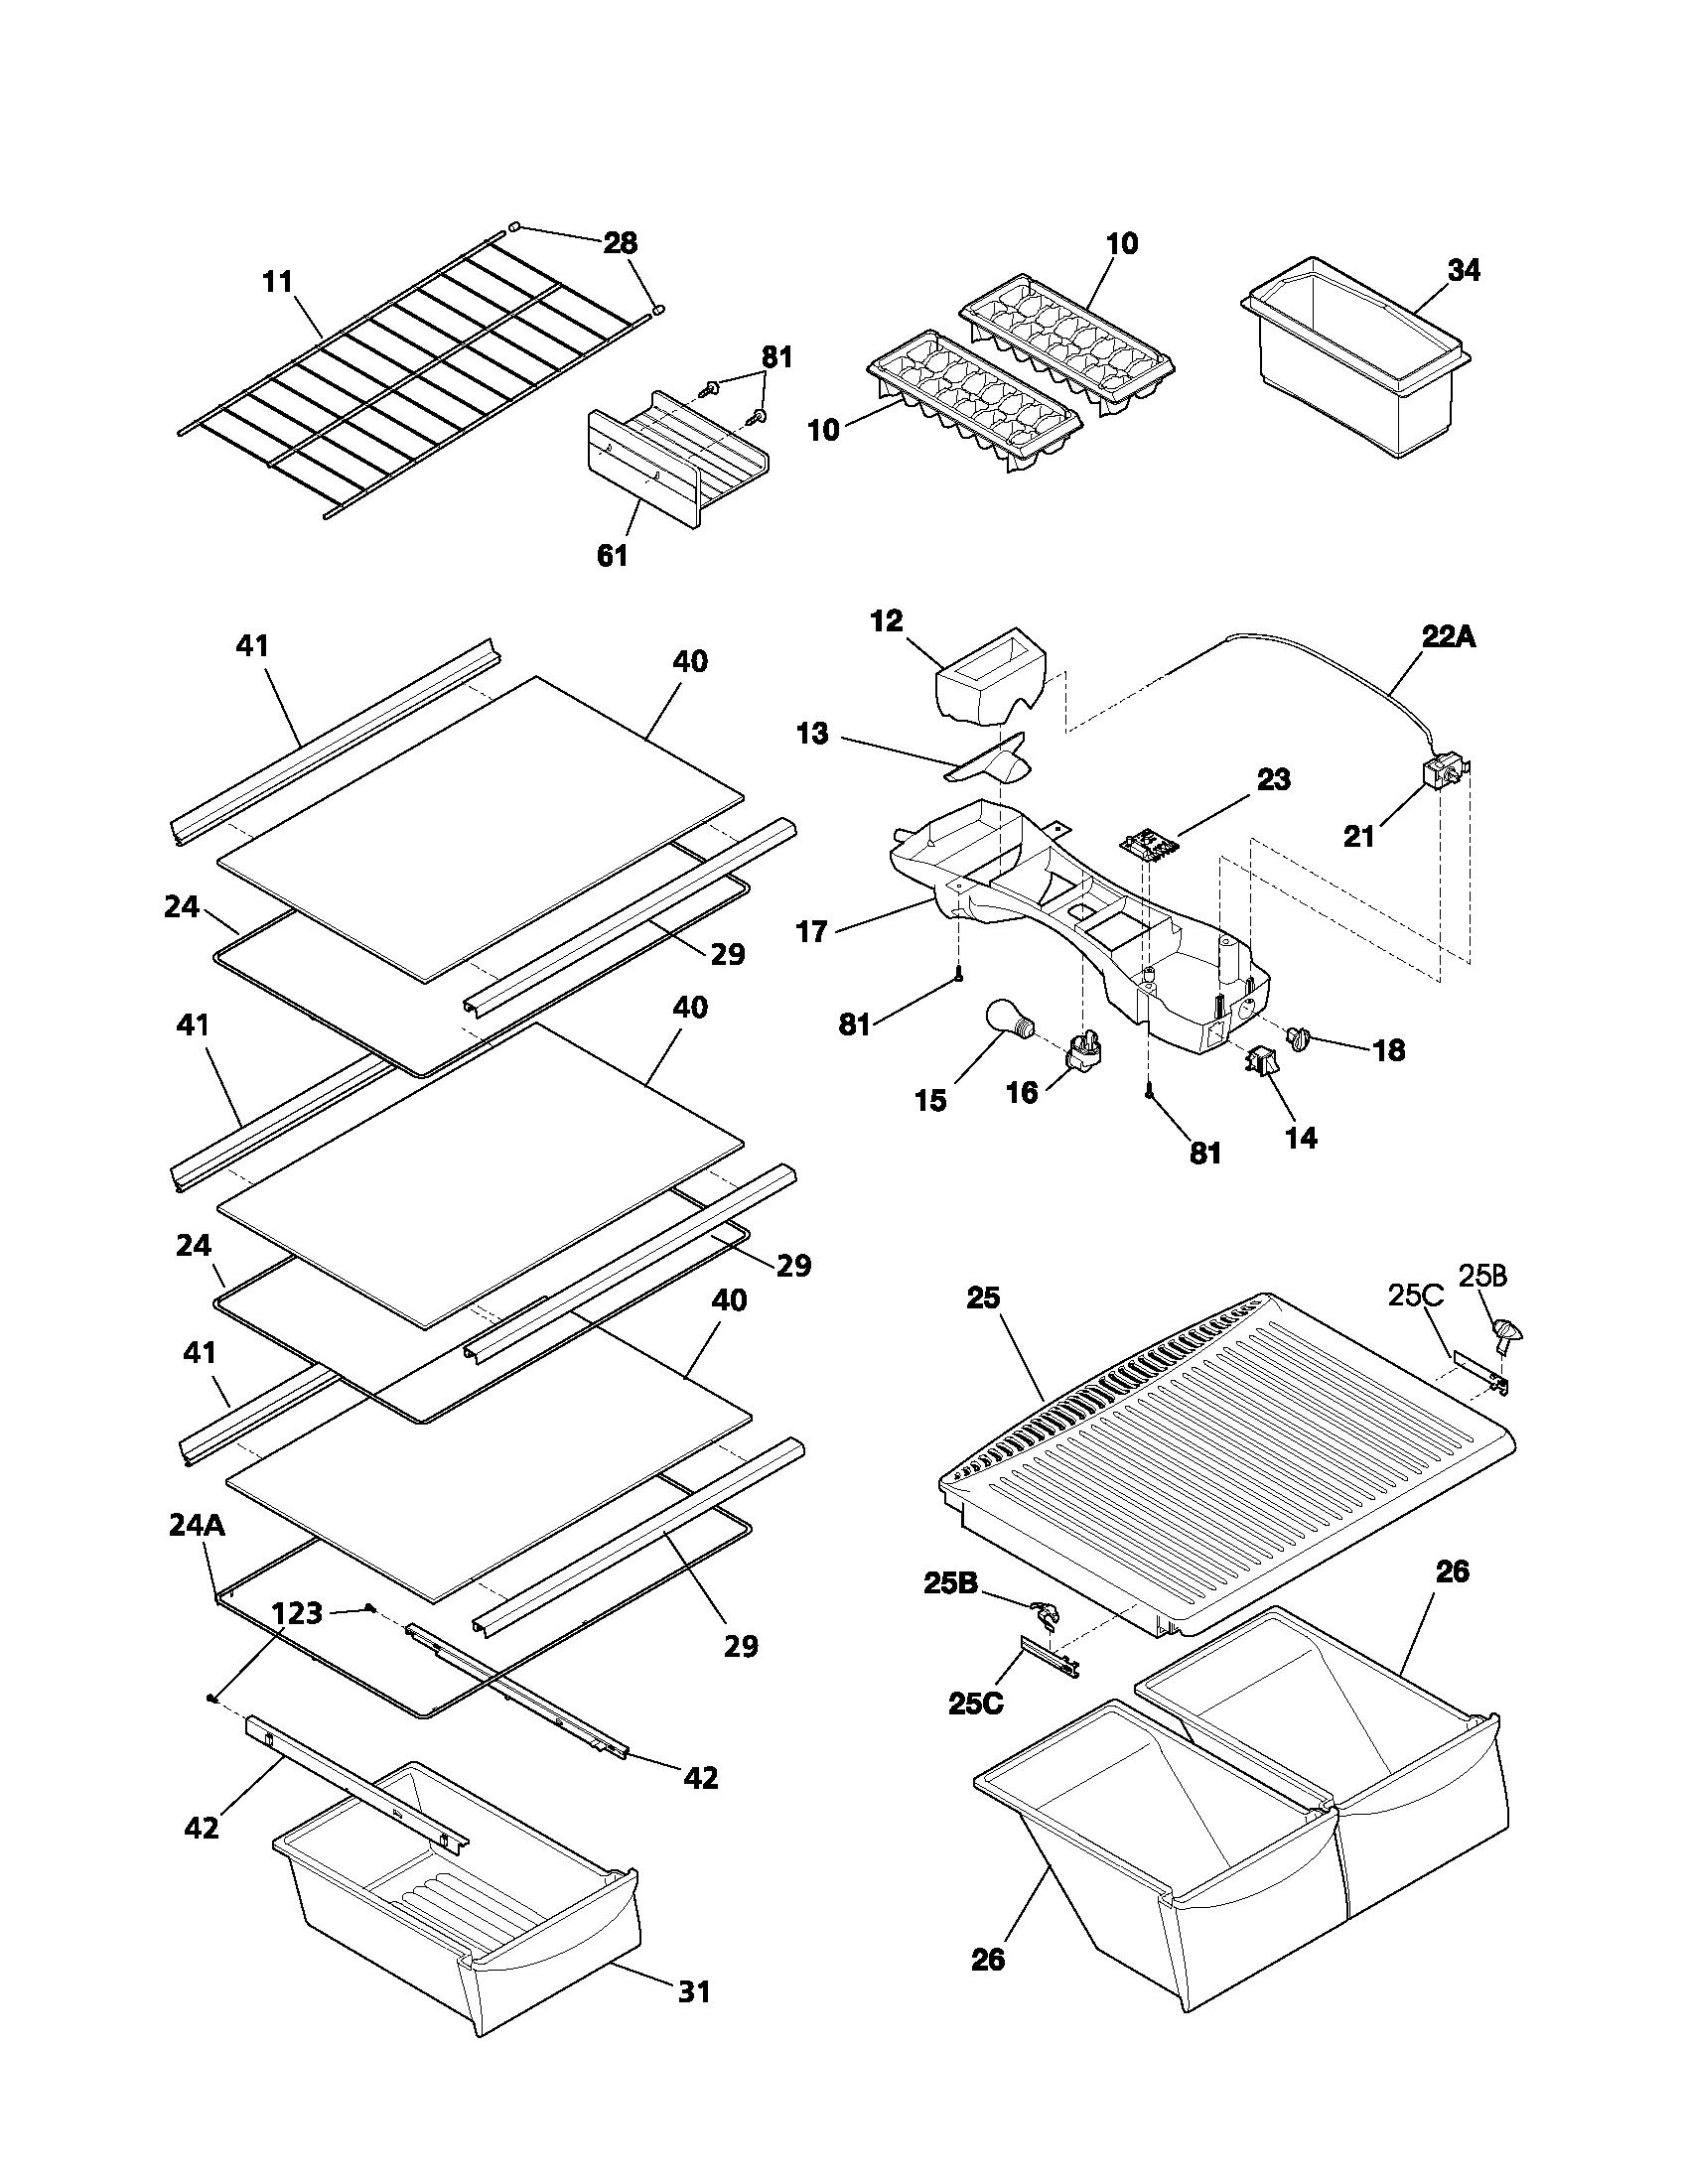 Whitewestinghouse refrigeratorparts diagram and parts list for whitewestinghouse refrigeratorparts 1700 x 2200 · 55 kb ·